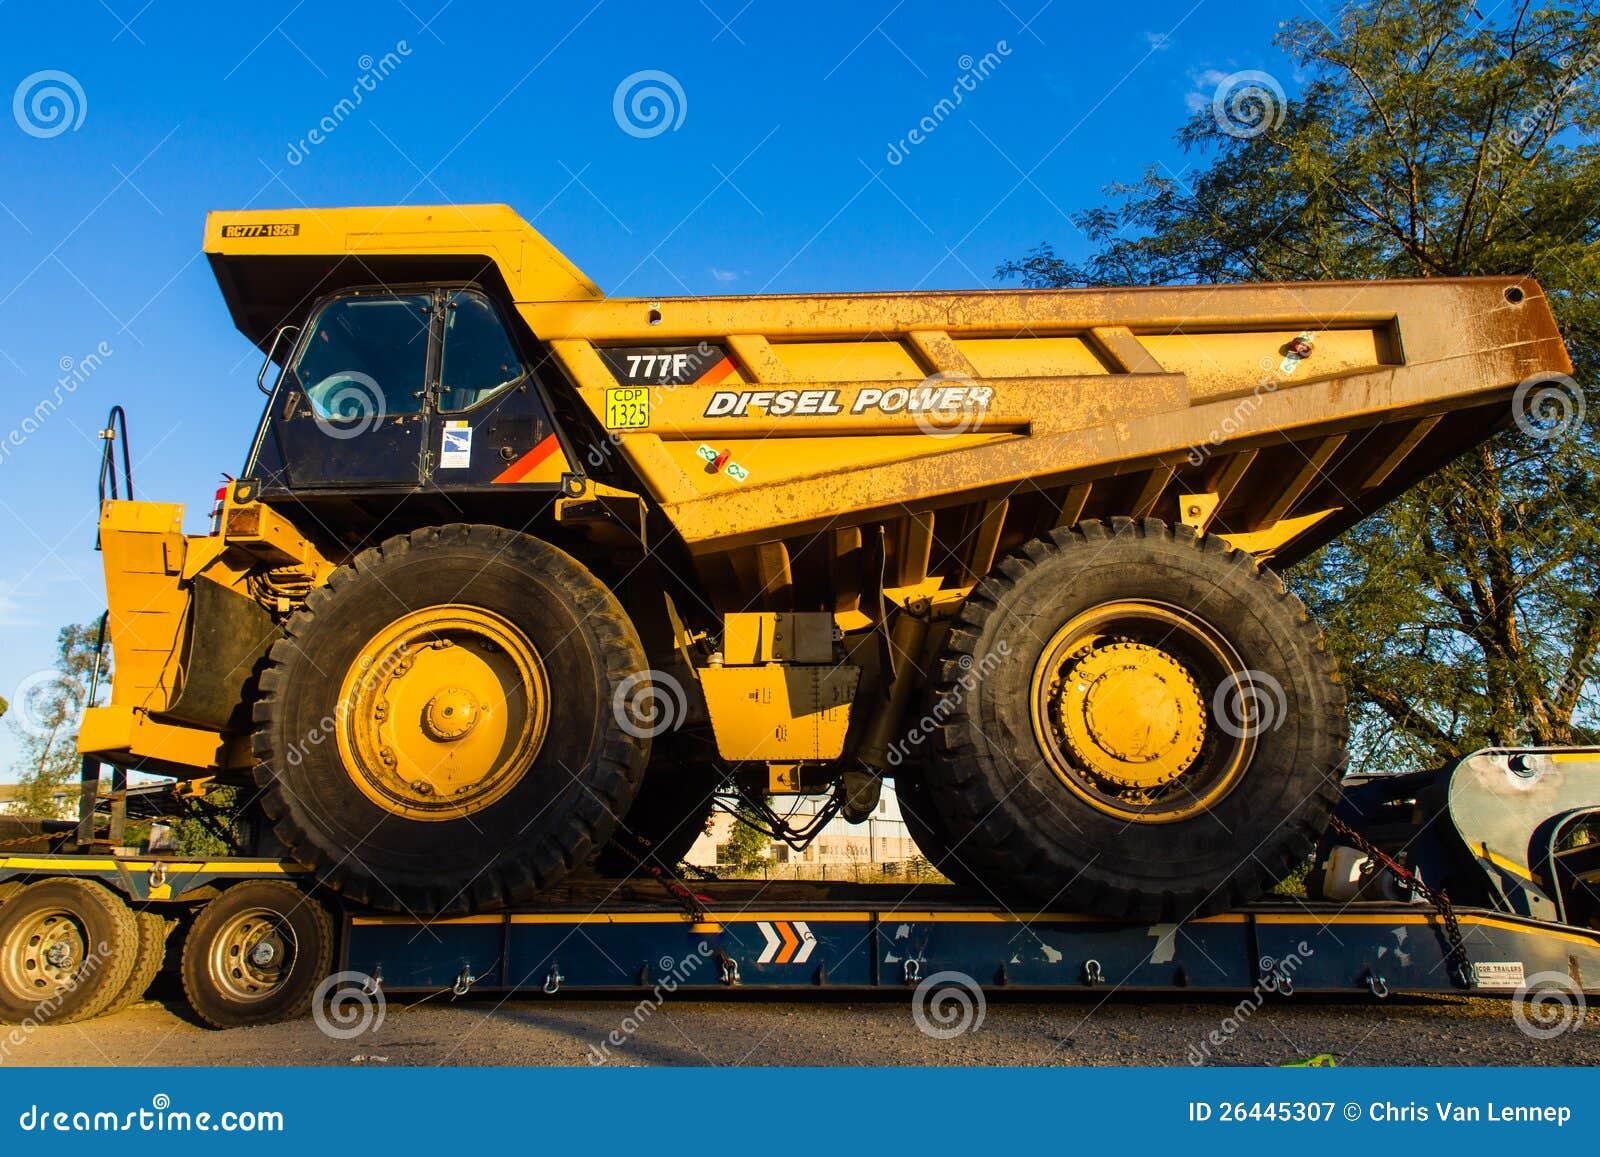 Large Industrial Mining Trucks